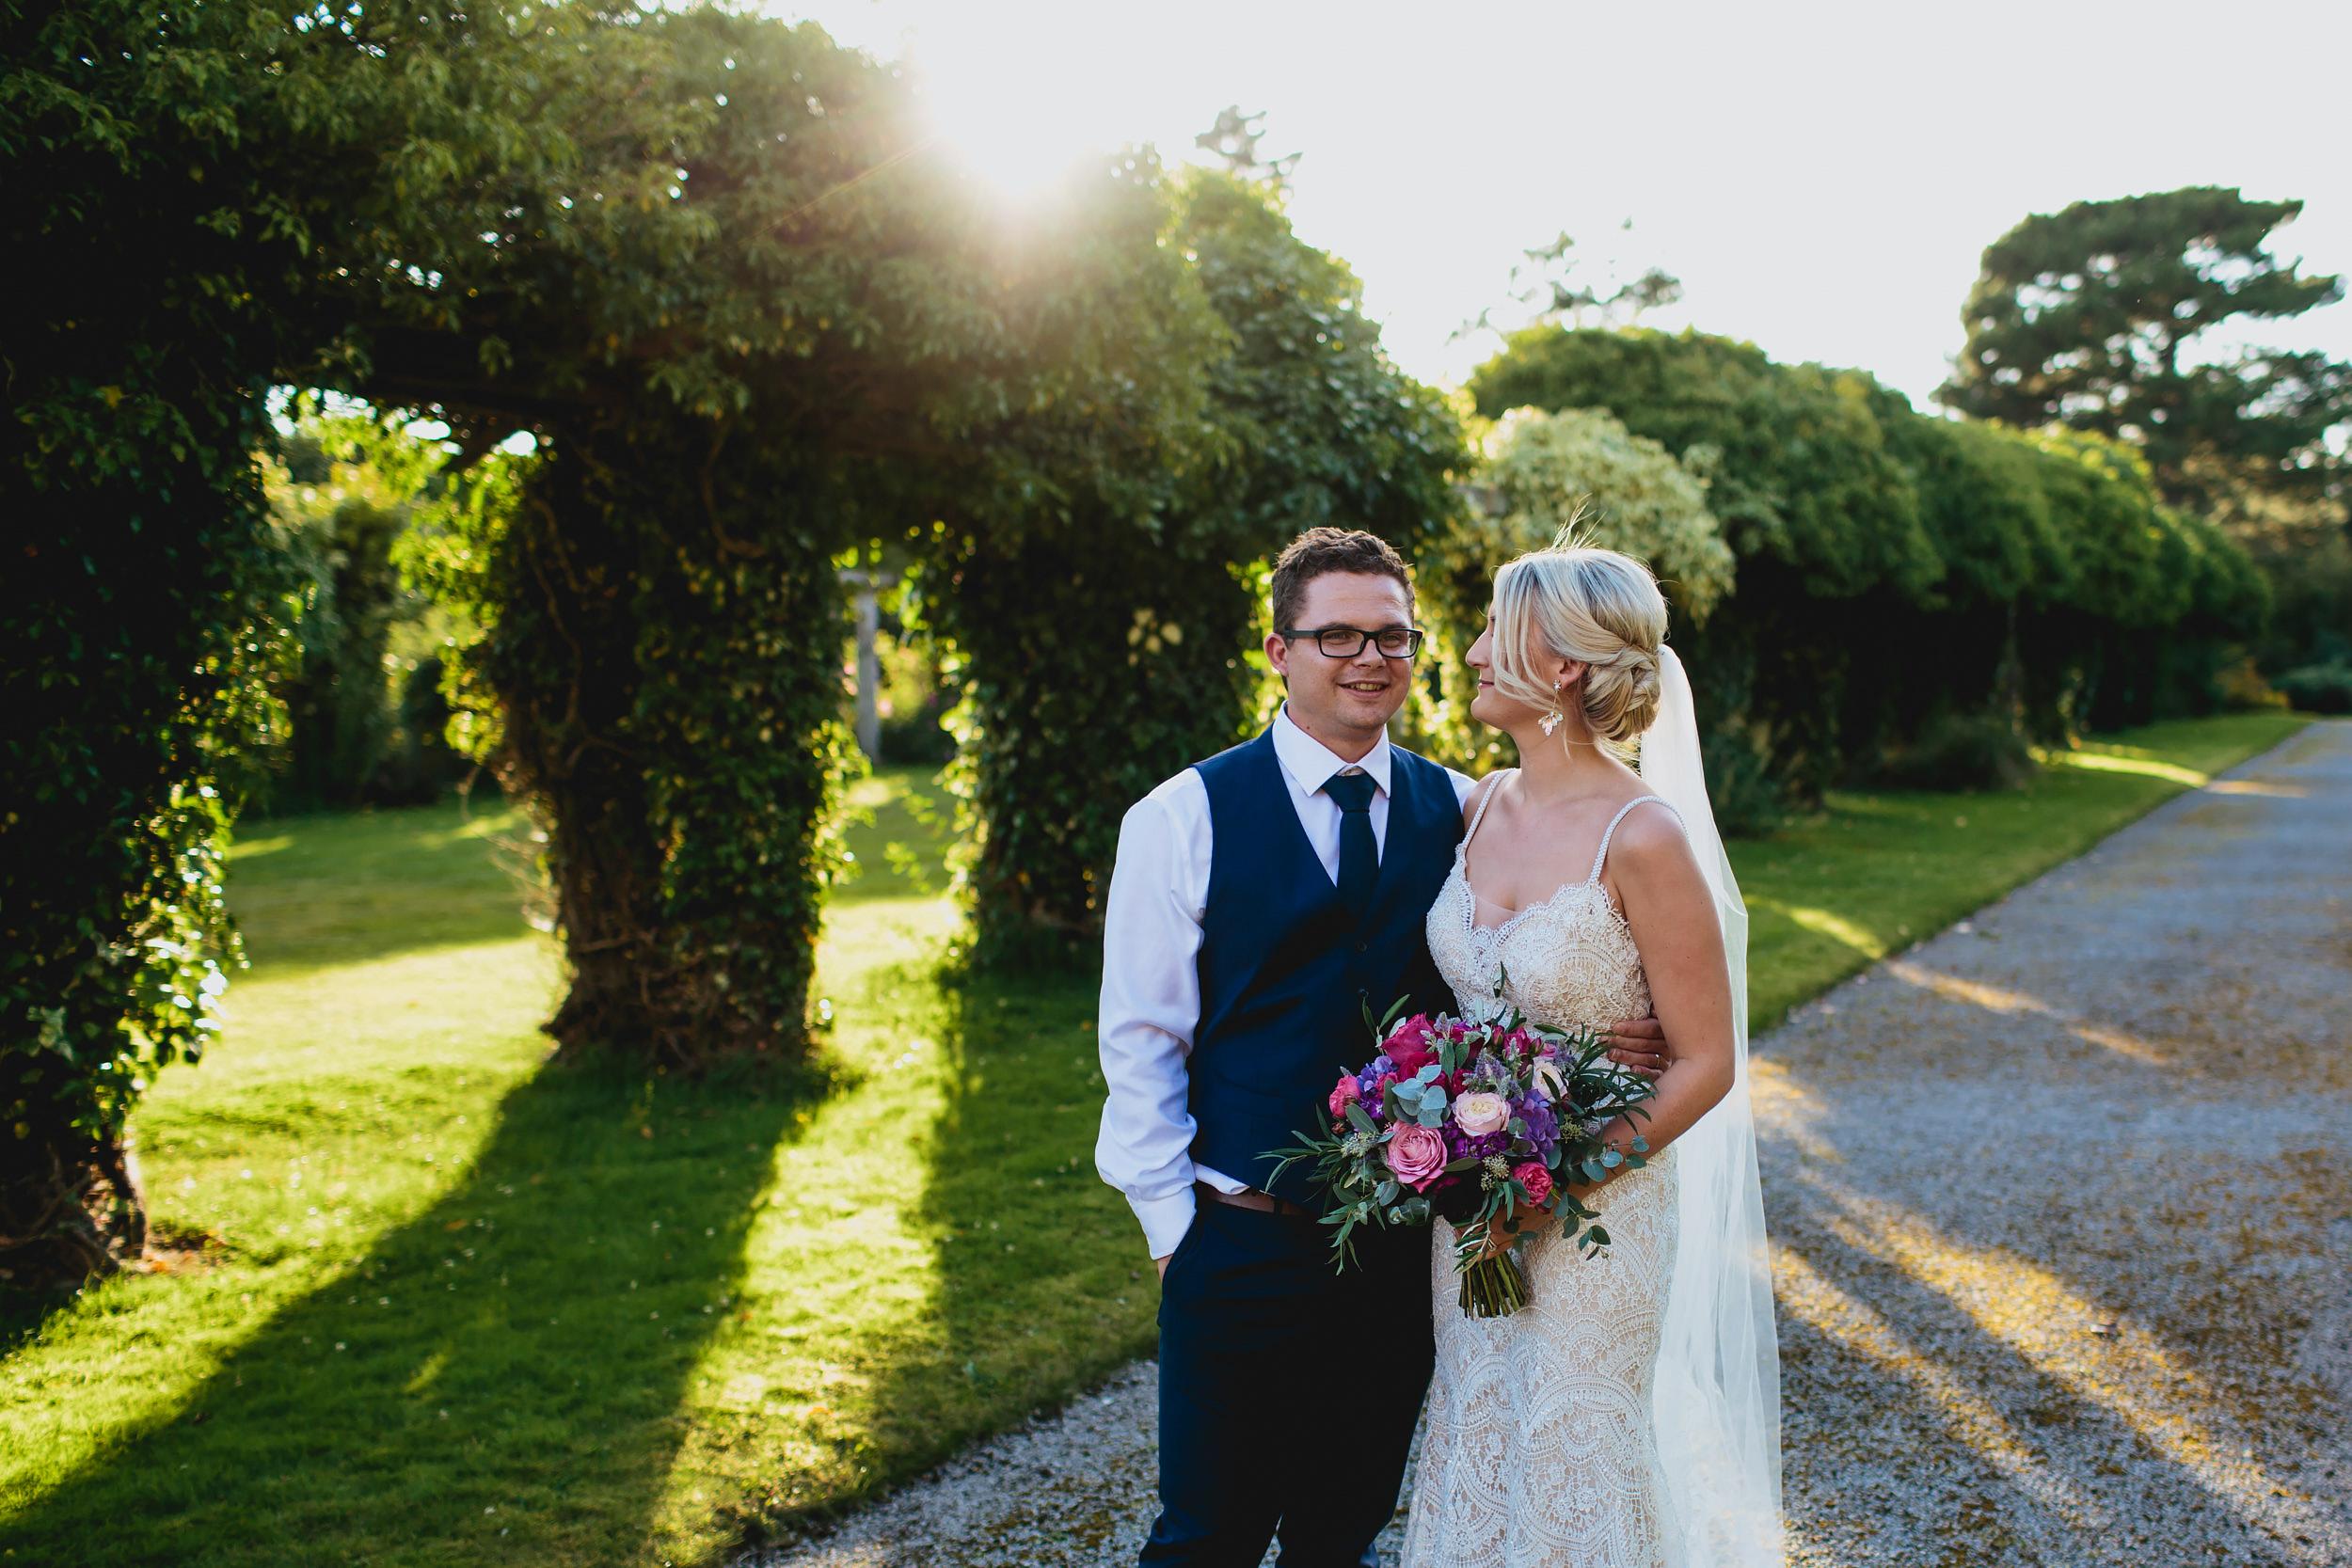 Wedding portrait at Thornton Manor Cheshire